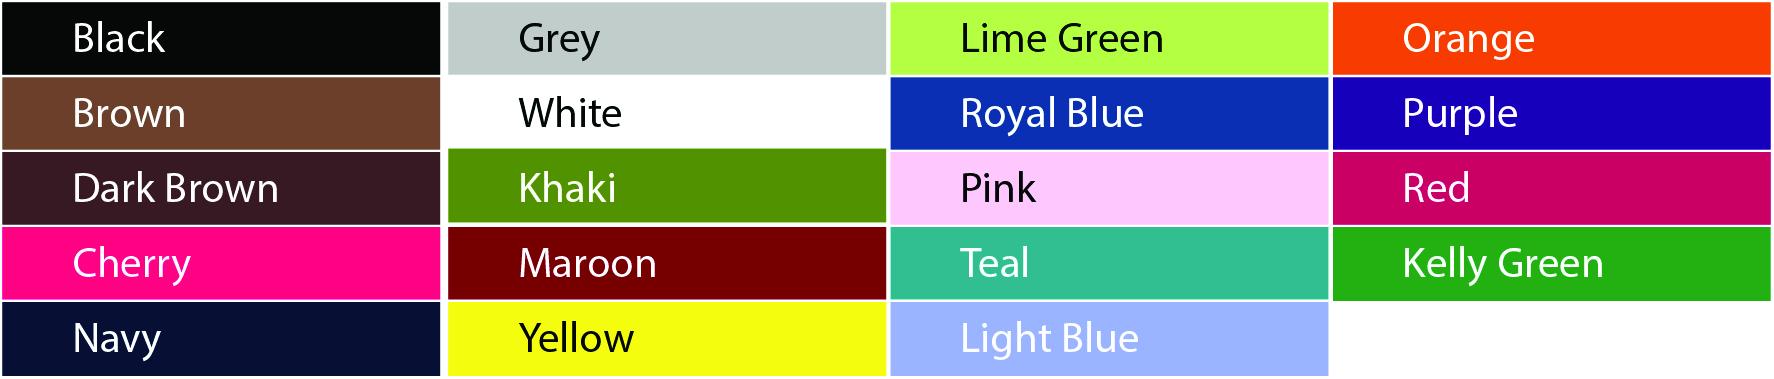 420 Shirt Colors